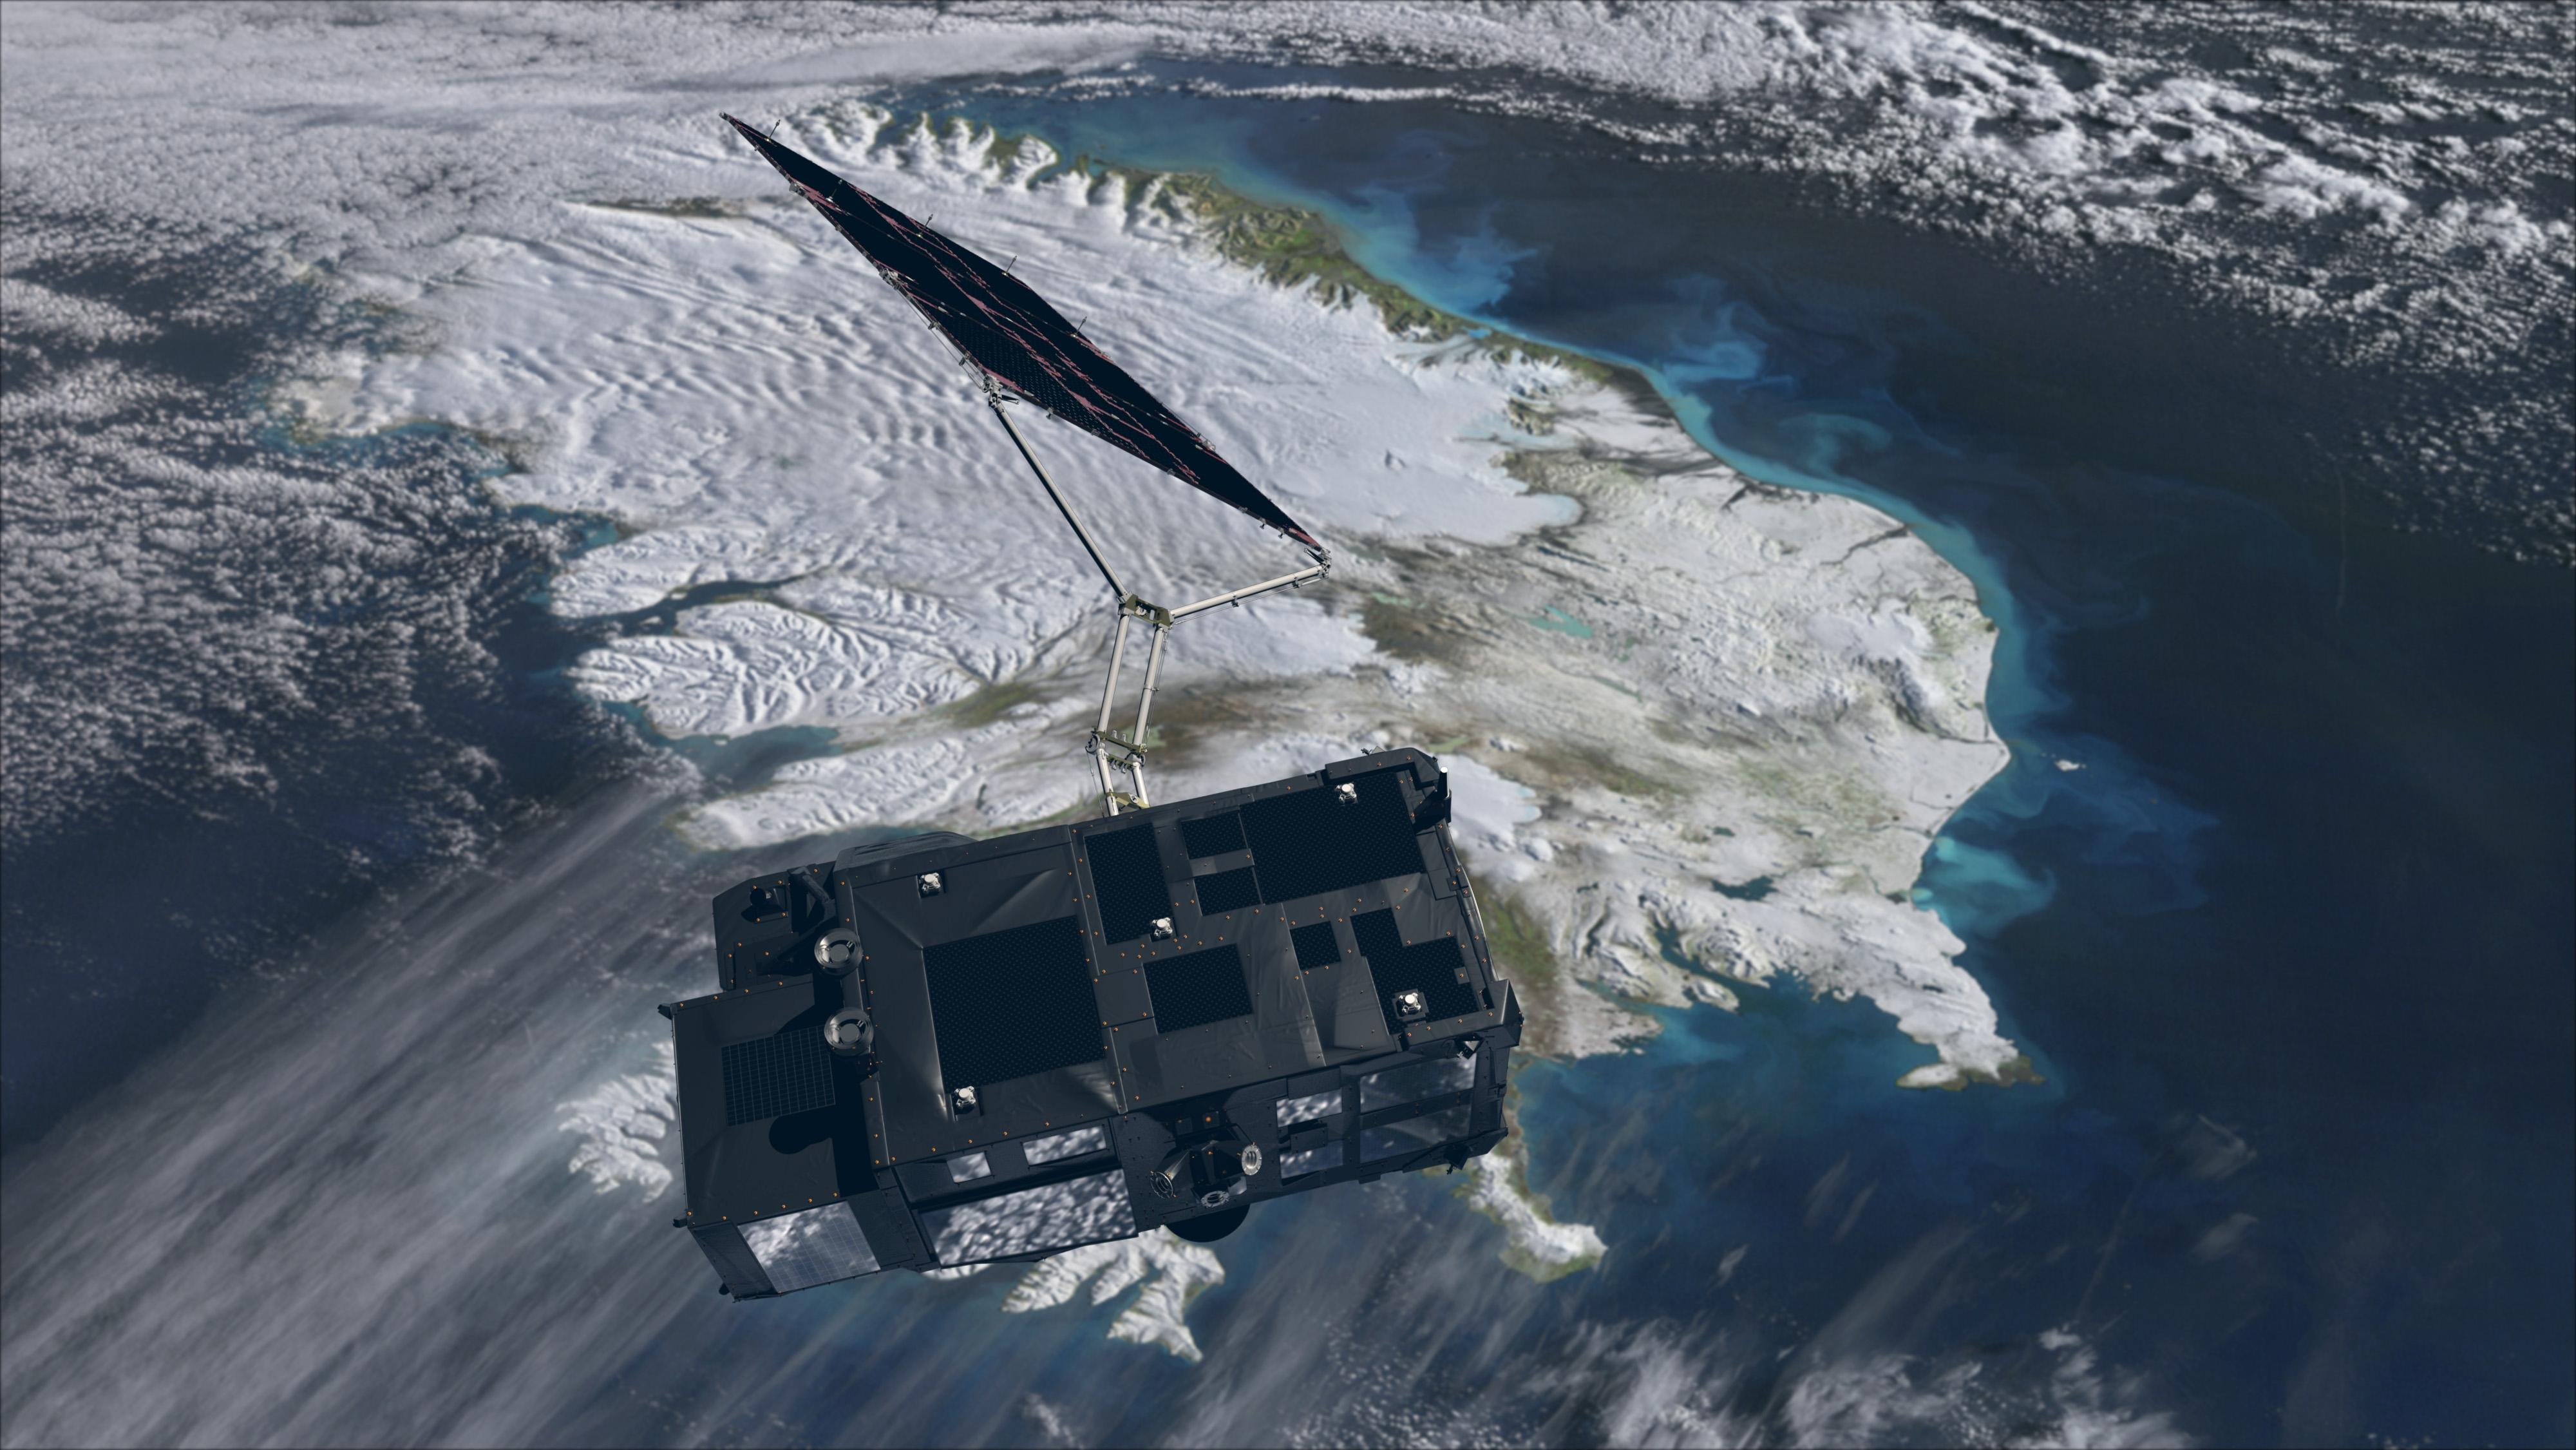 bpc_sentinel-3-over-ocean-and-ice.jpg